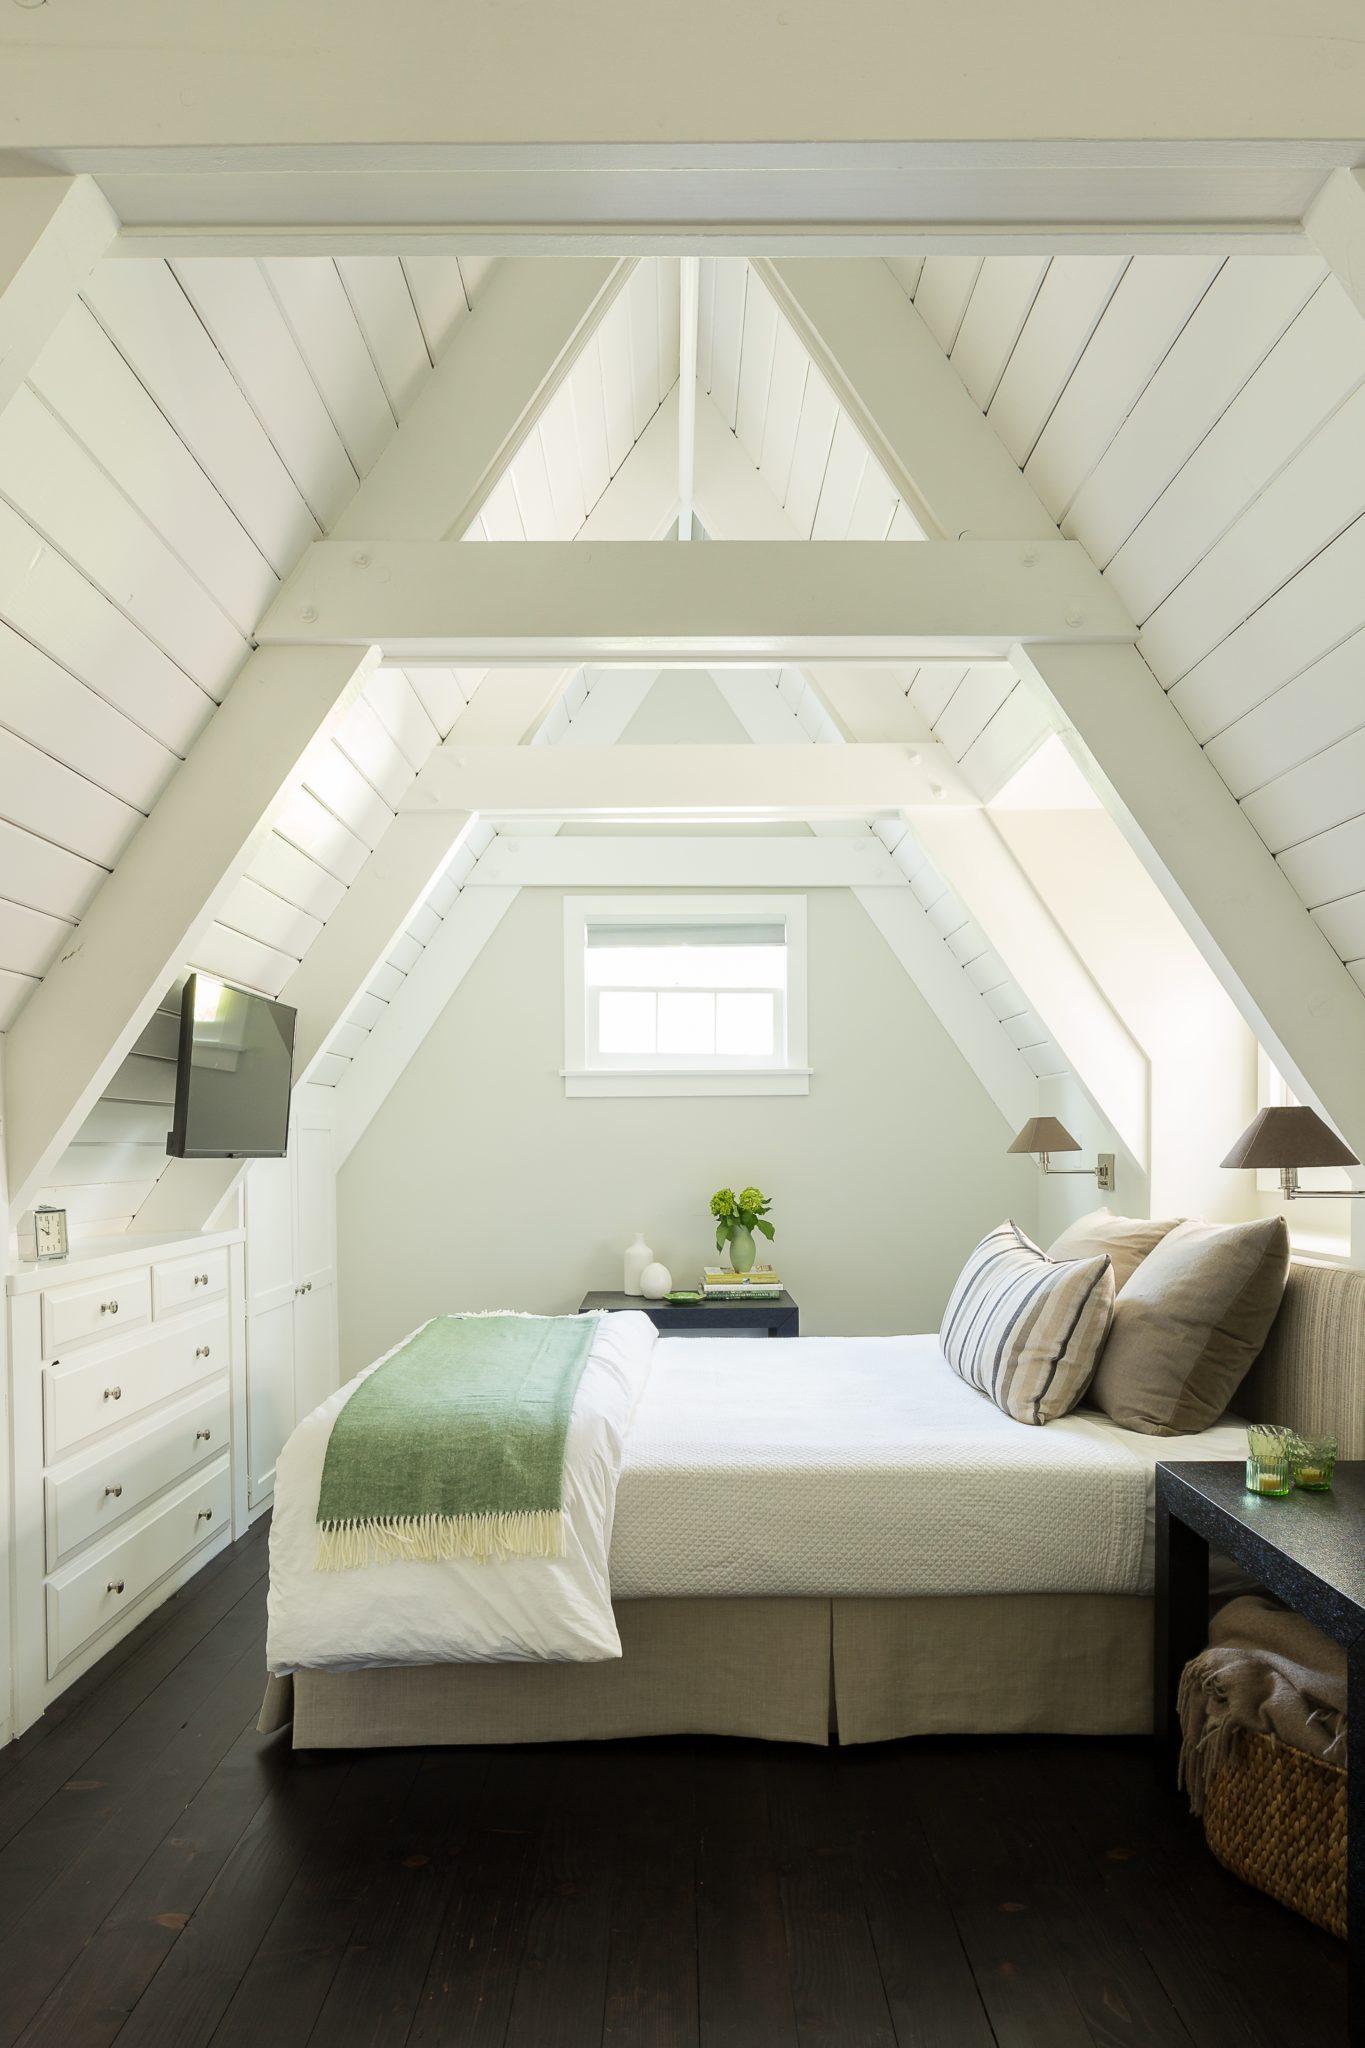 A-Frame Bedroom in Guest Cottage by Gilmore Design Studio